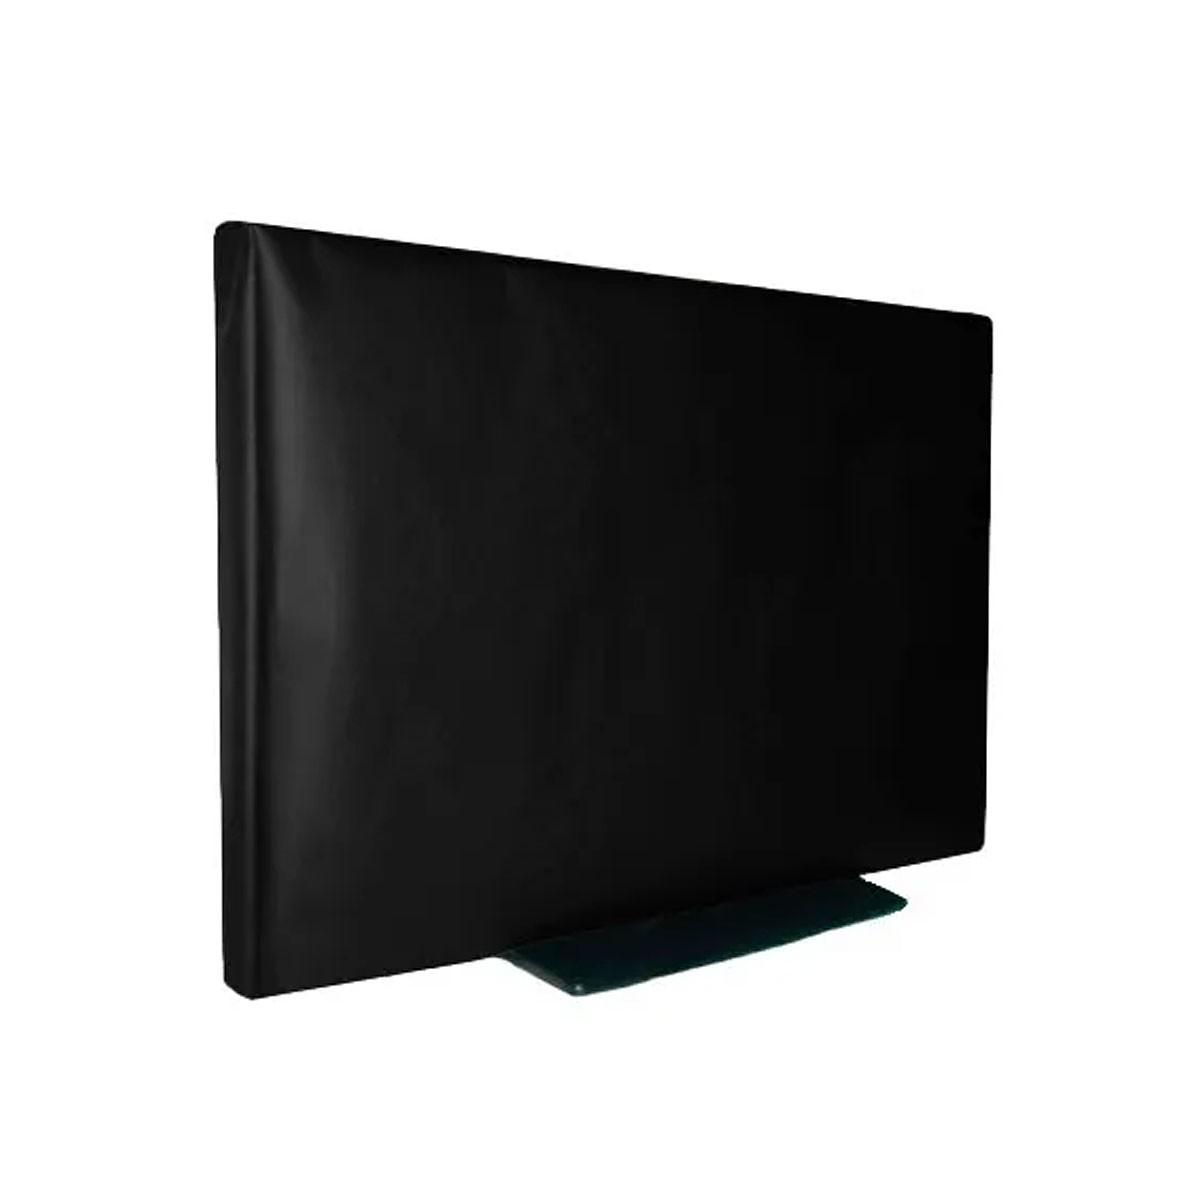 Capa De Luxo Em Corino Para TV LCD 32